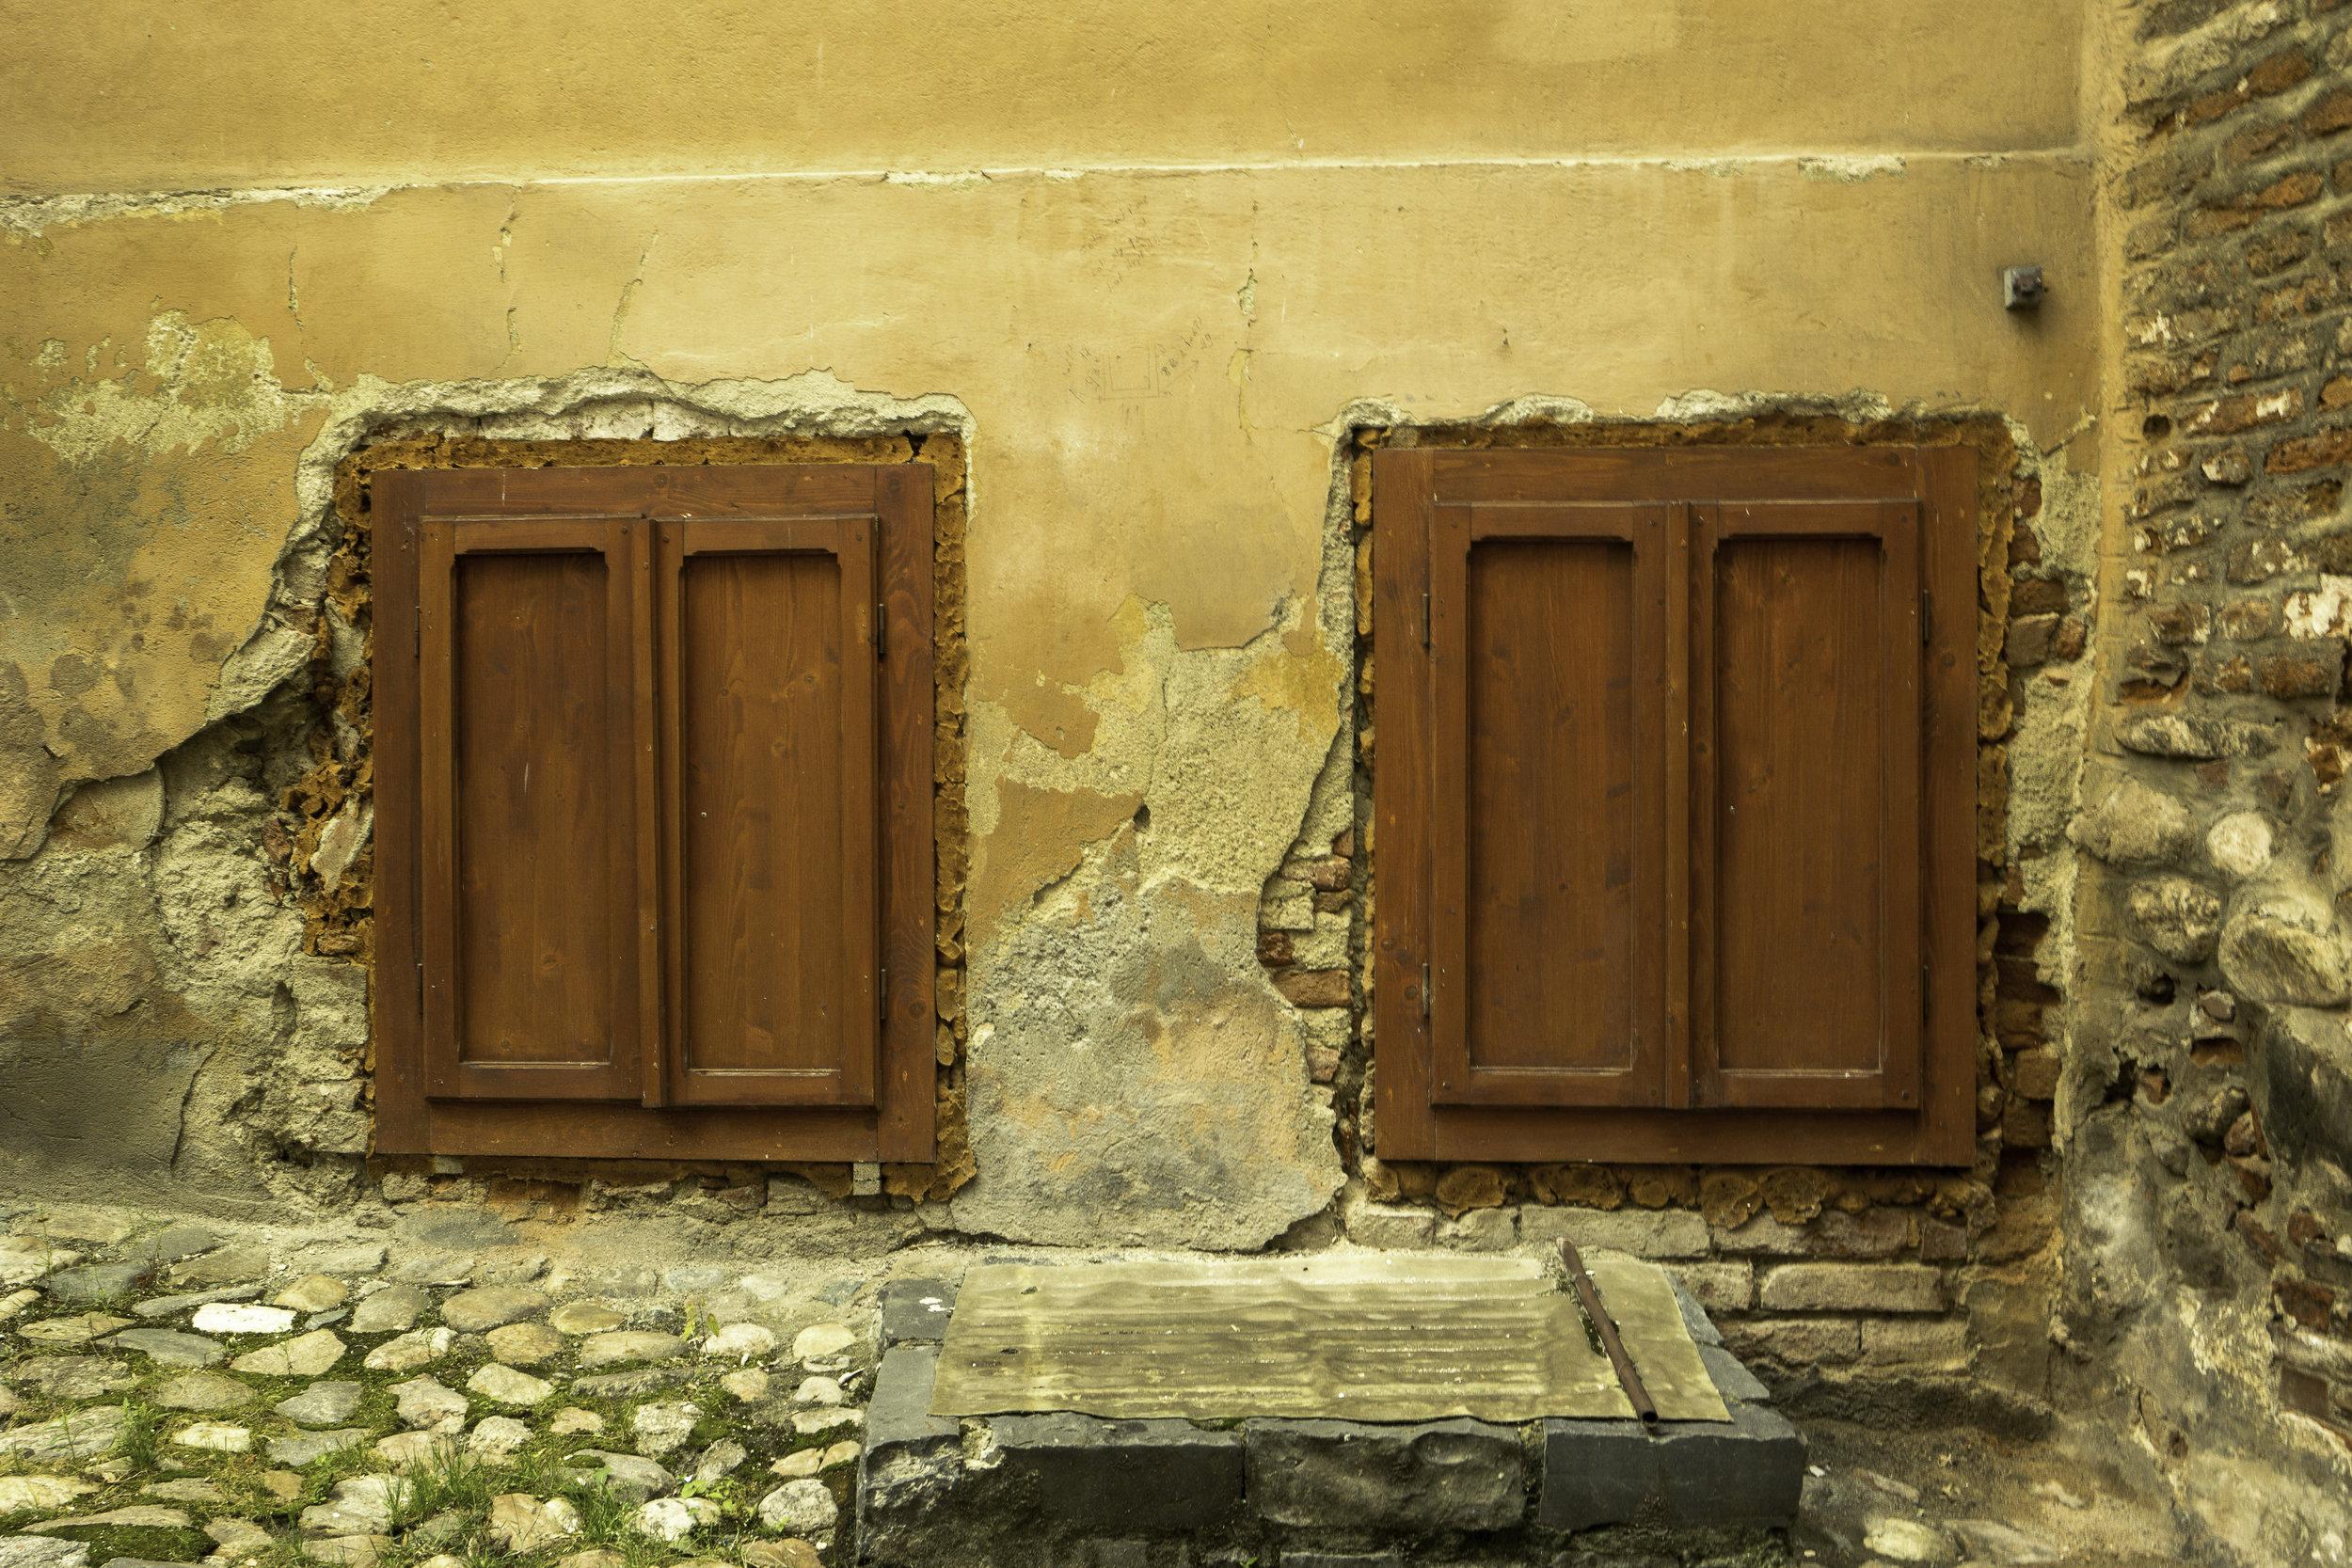 Closed-eyes-windows-Romania.jpg